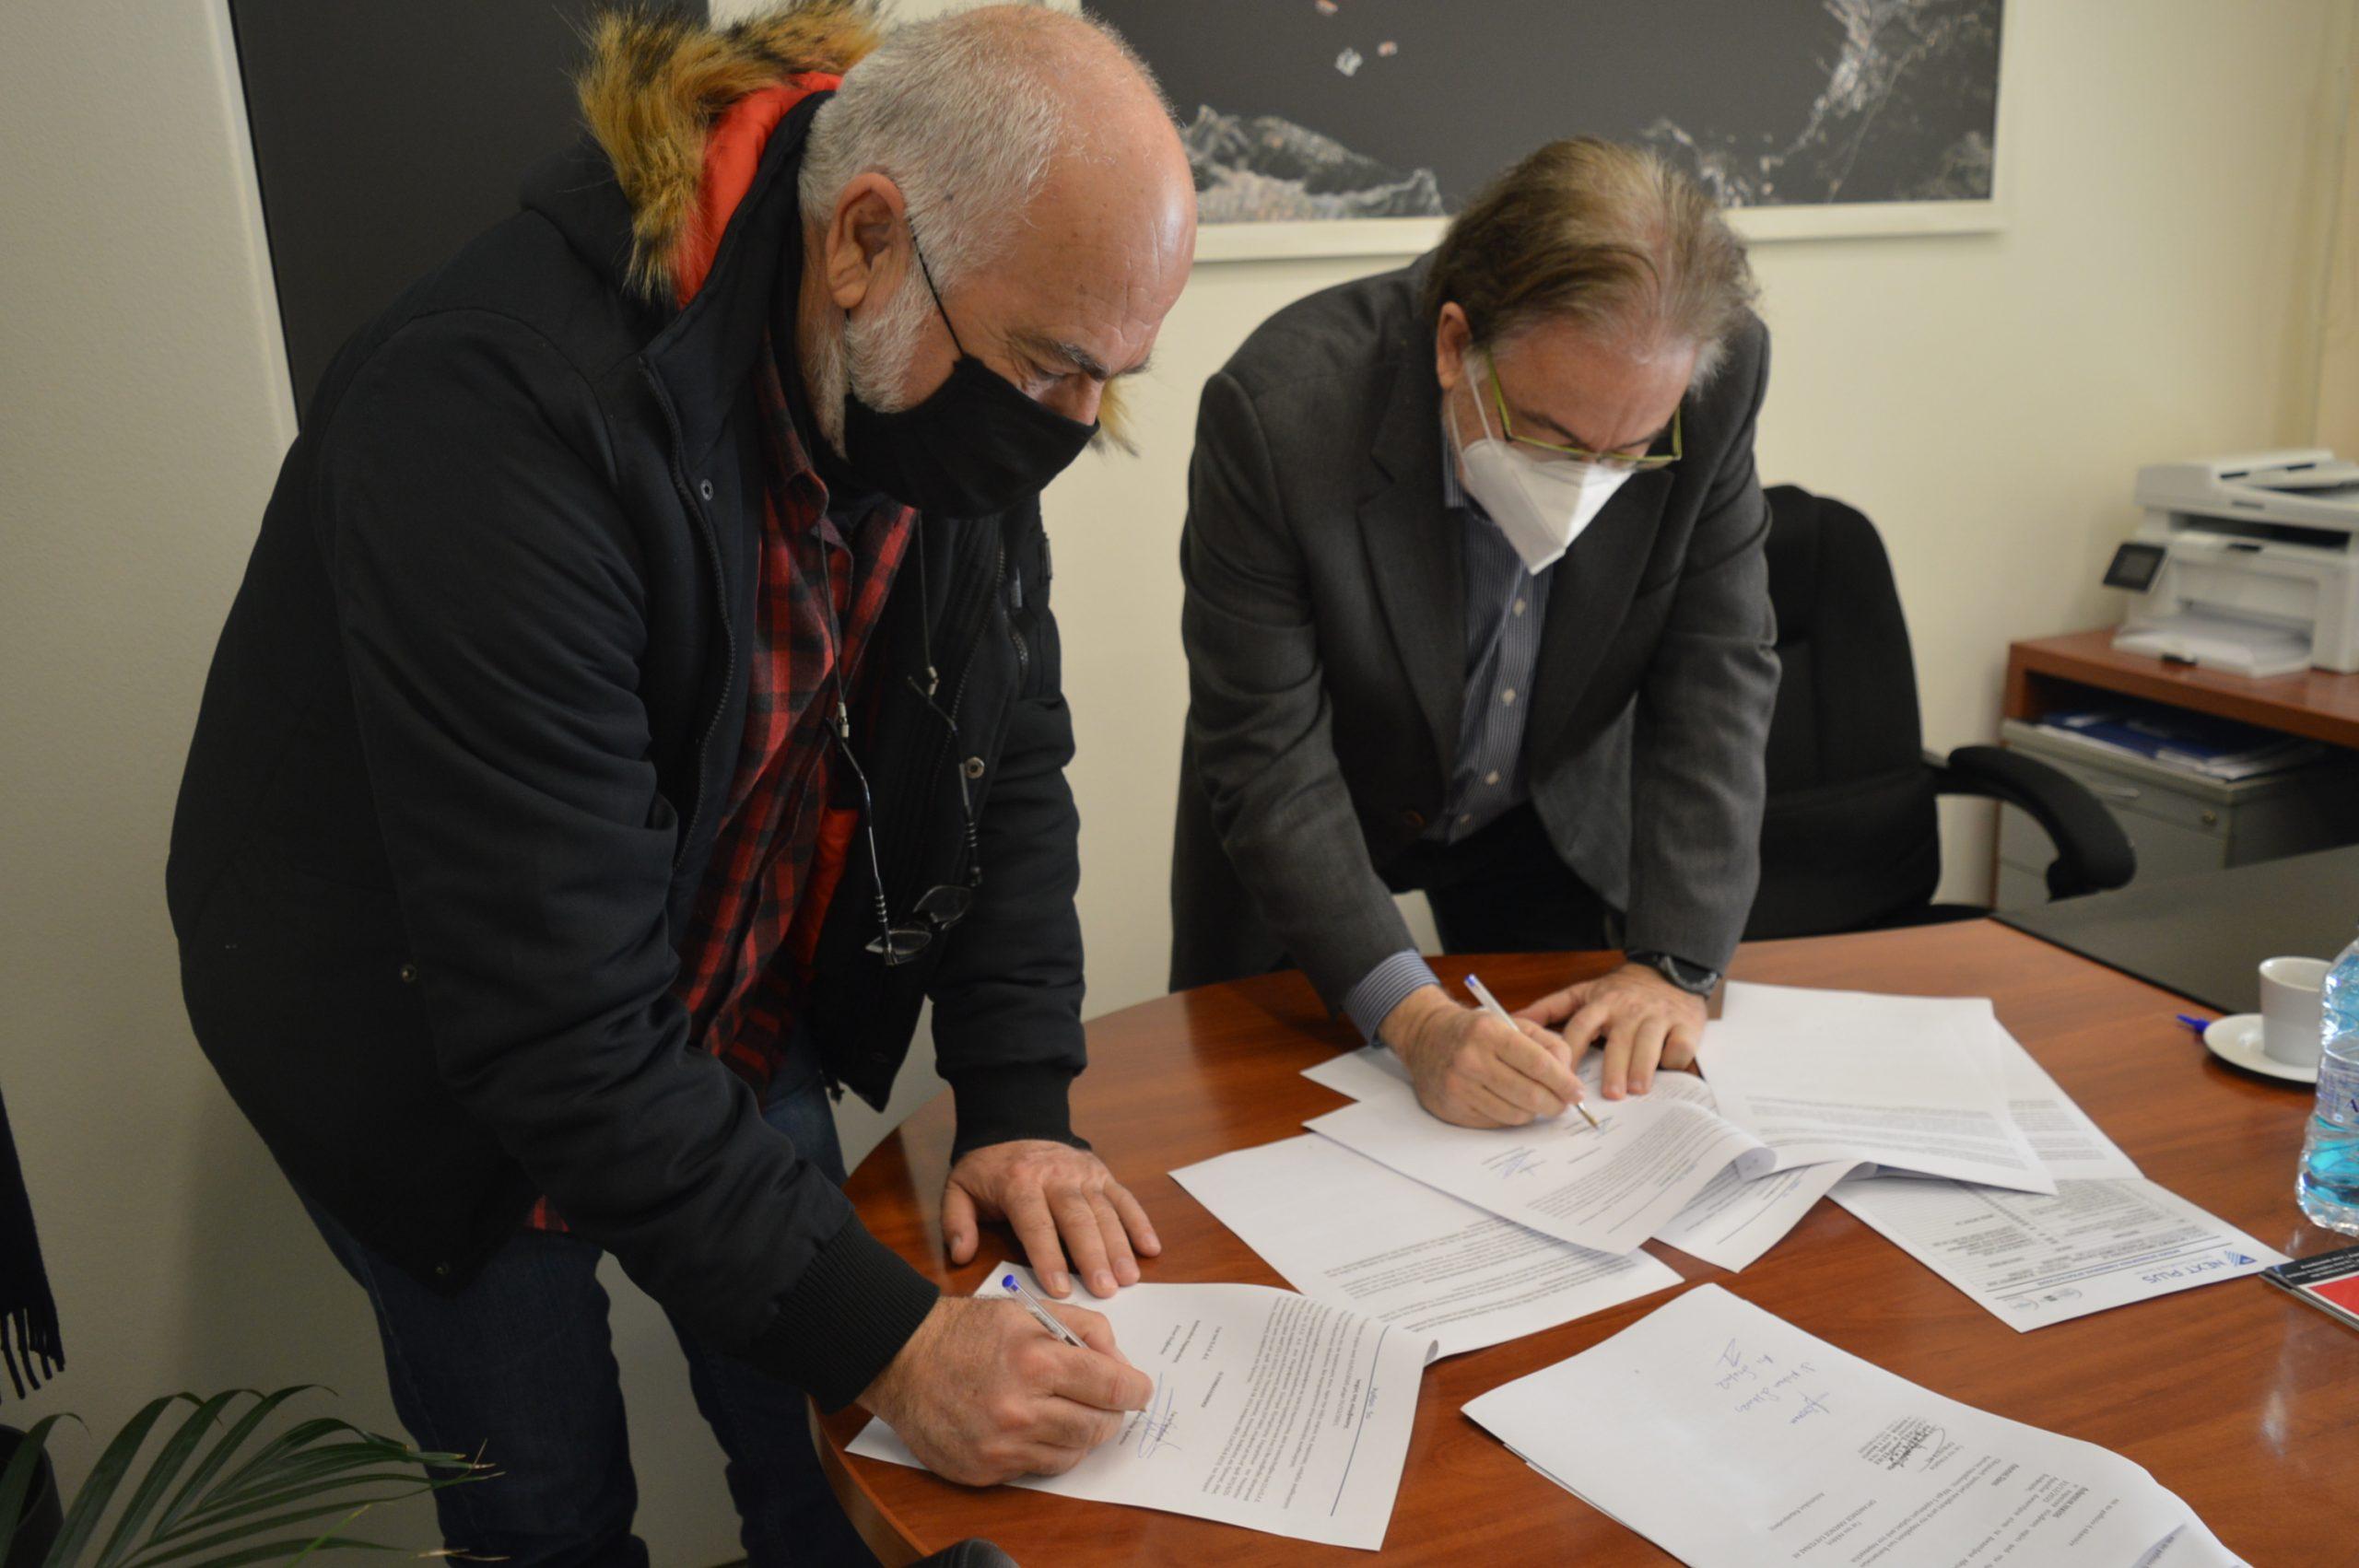 You are currently viewing Υπογράφηκε η νέα Επιχειρησιακή Συλλογική Σύμβαση Εργασίας του υπαλληλικού προσωπικού στον Ο.Λ.Ε. ΑΕ